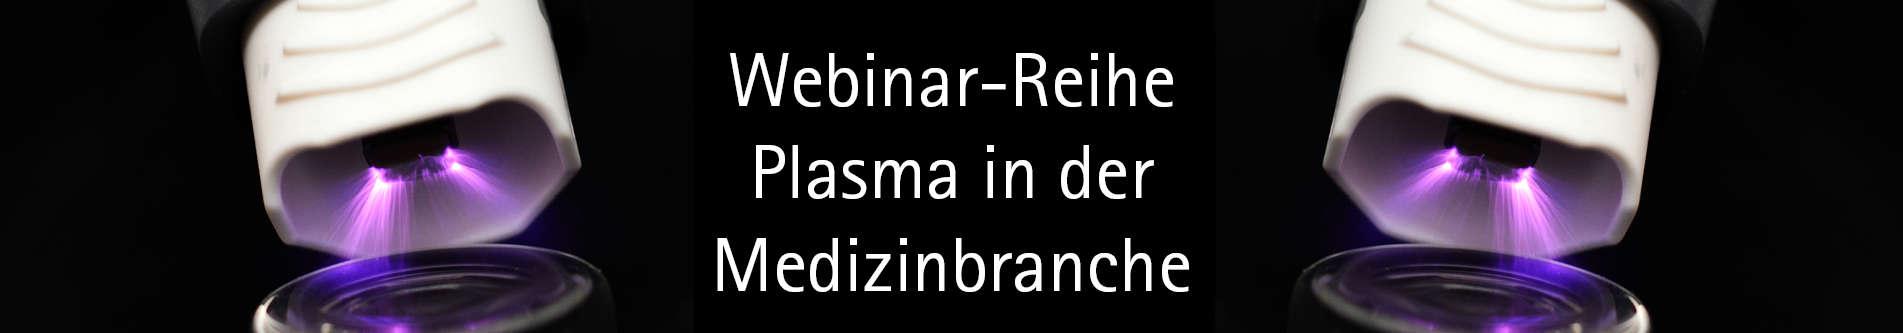 Webinar-Reihe: Plasma in der Medizinbranche